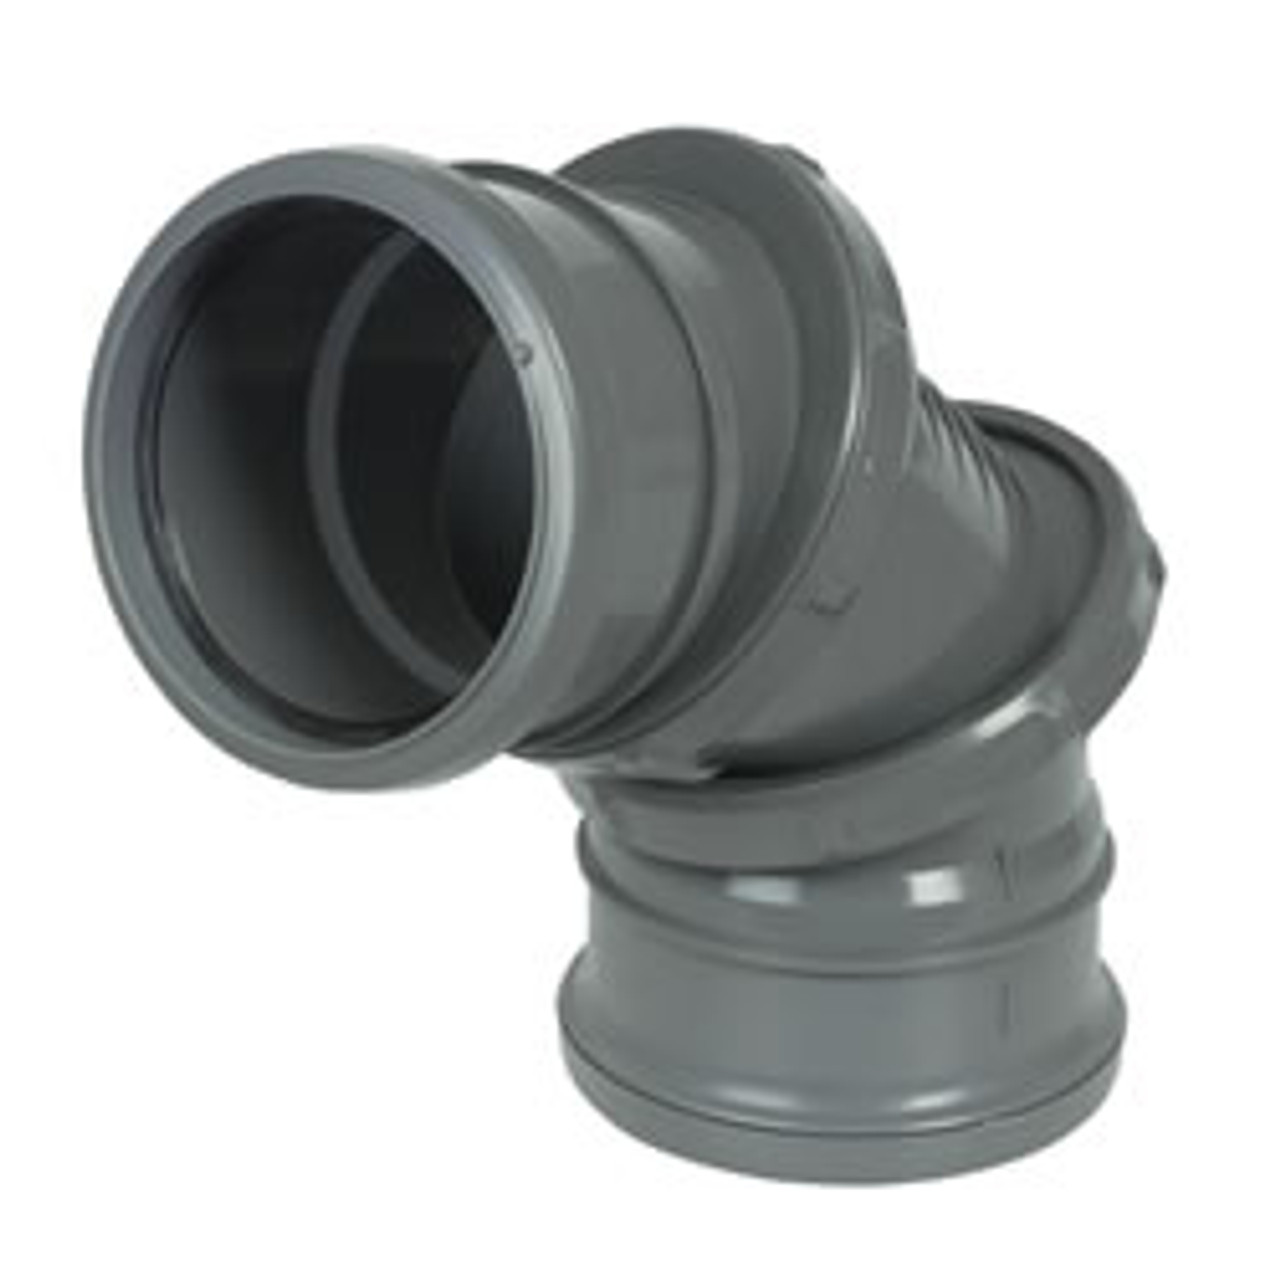 0-90dg Adjustable Double Socket Soil Bend